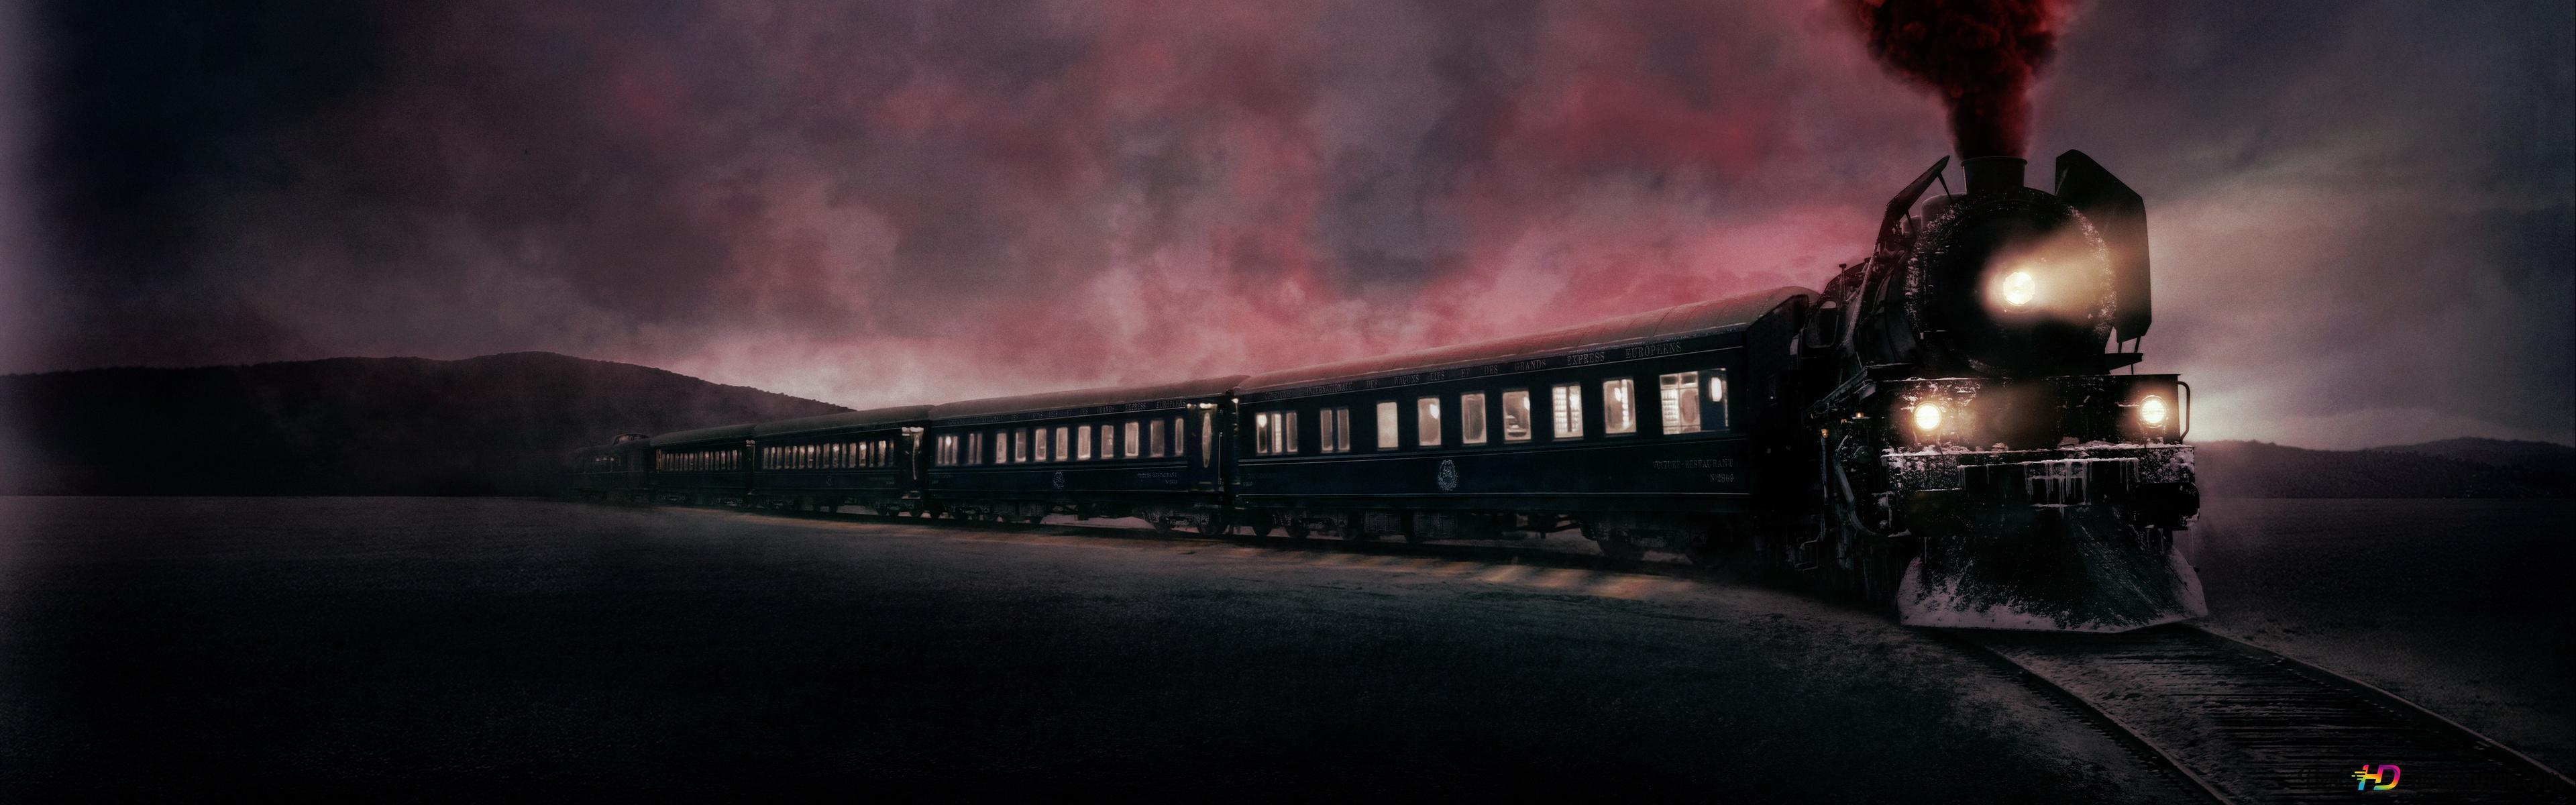 Murder On The Orient Express Hd Wallpaper Download